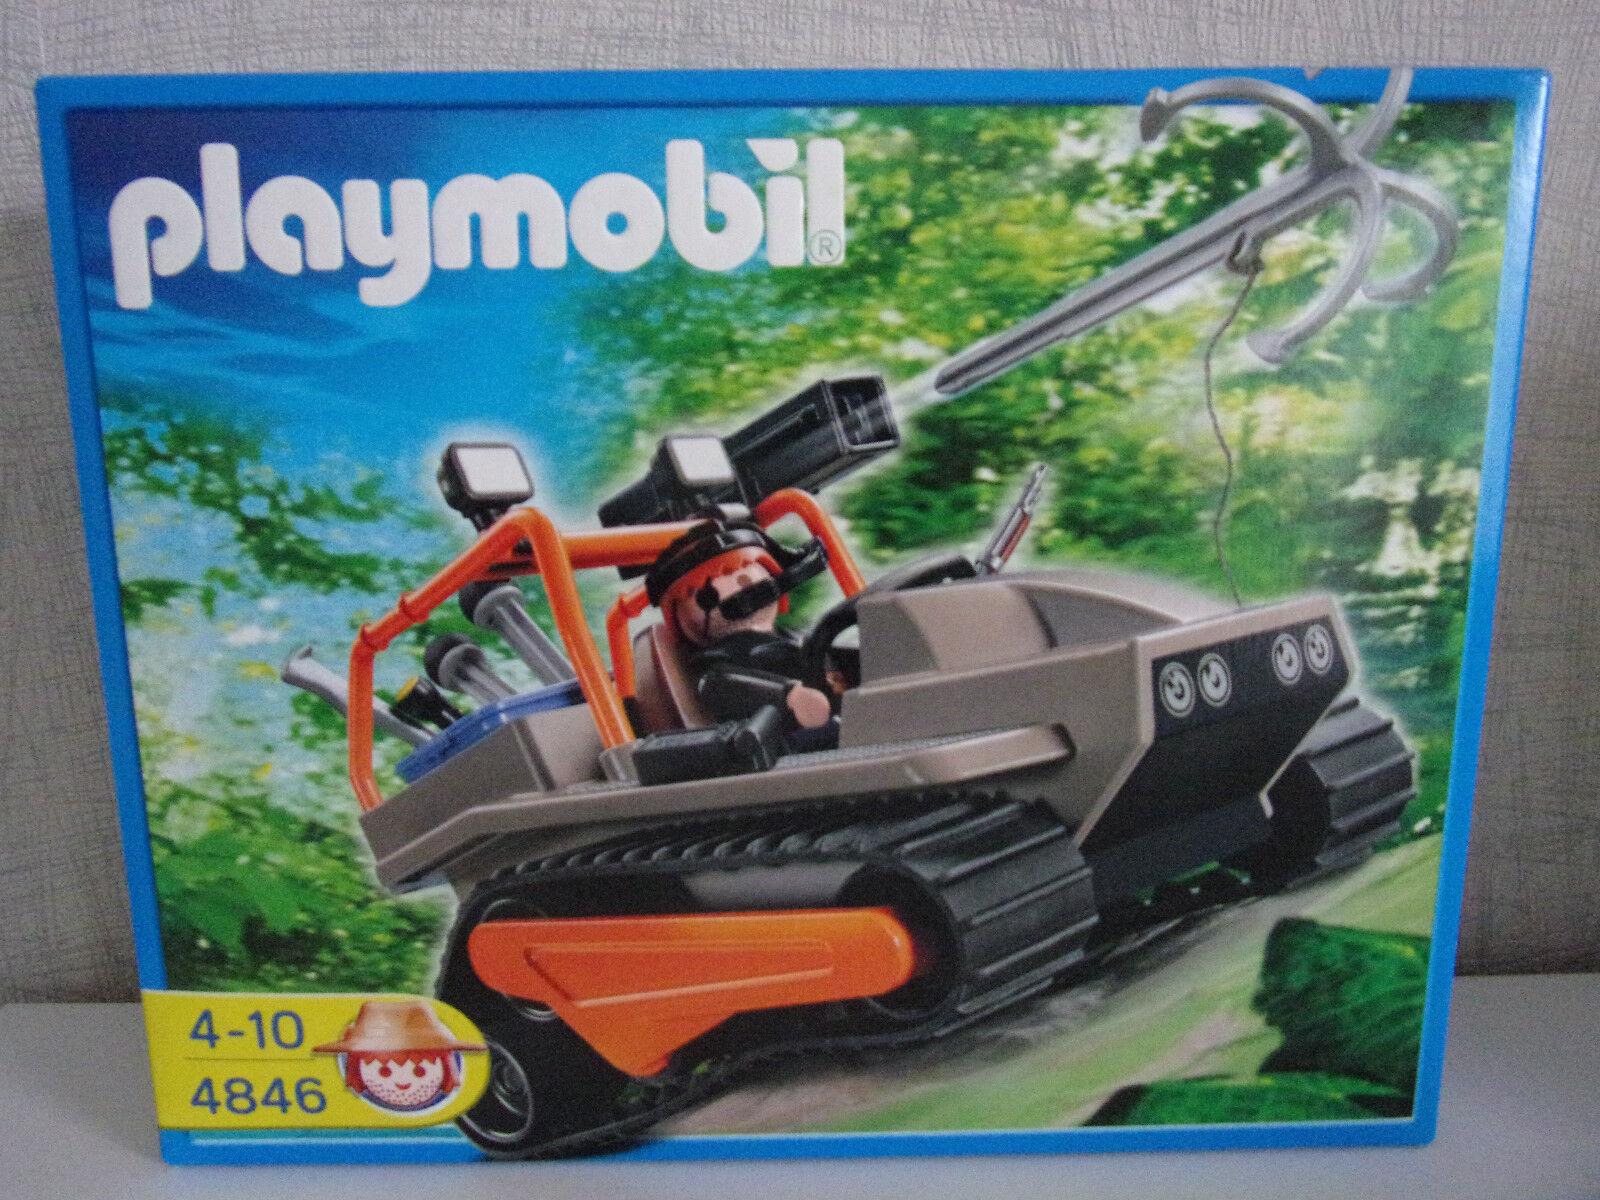 Playmobil 4846 schatzräuber-kettenraupe - Neuf et emballage d'origine